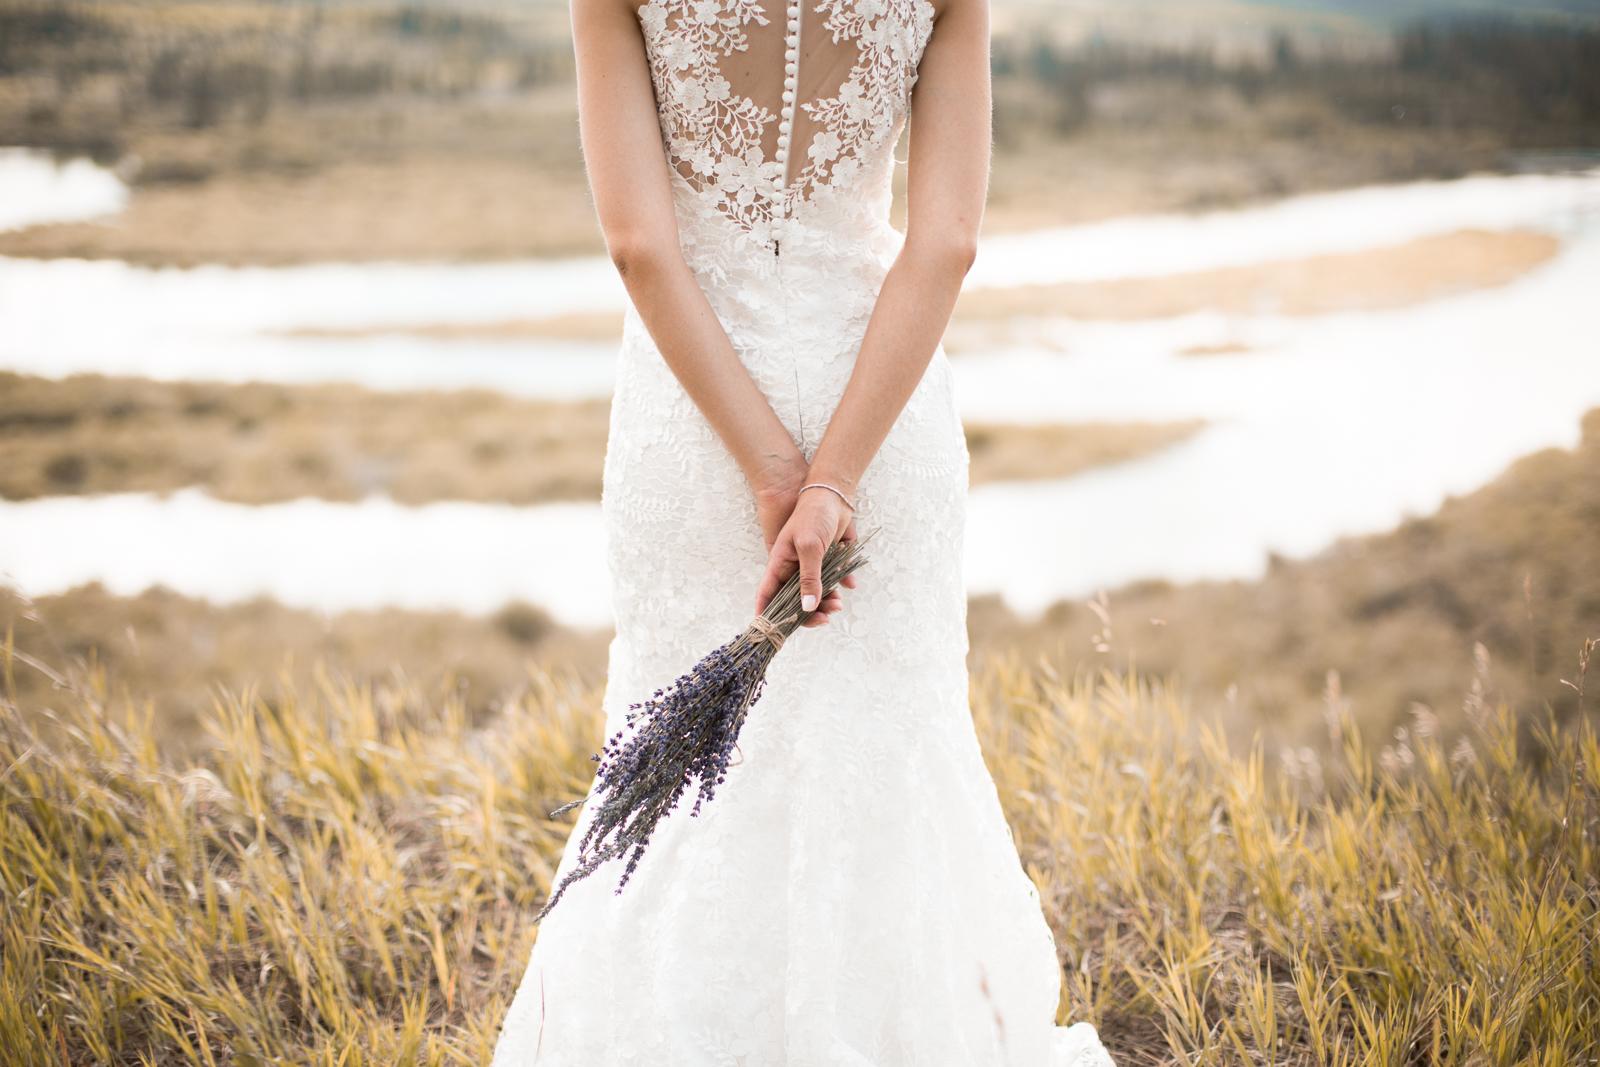 92Andrew_Pavlidis_Photography_Kasia_and_Michael_Calgary_Wedding_Blog-208622